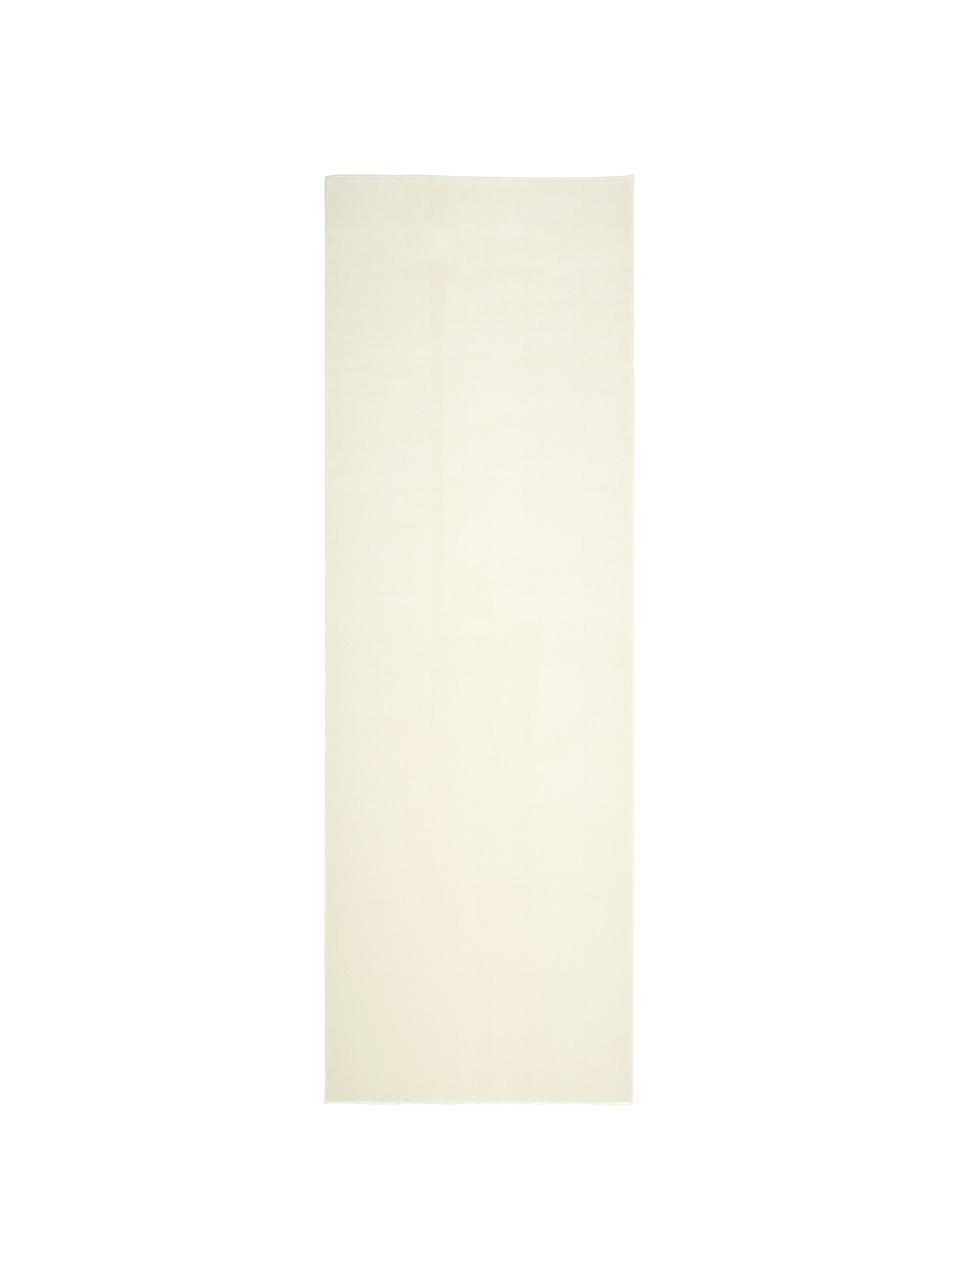 Wollläufer Ida in Beige, Flor: 100% Wolle, Beige, 80 x 250 cm